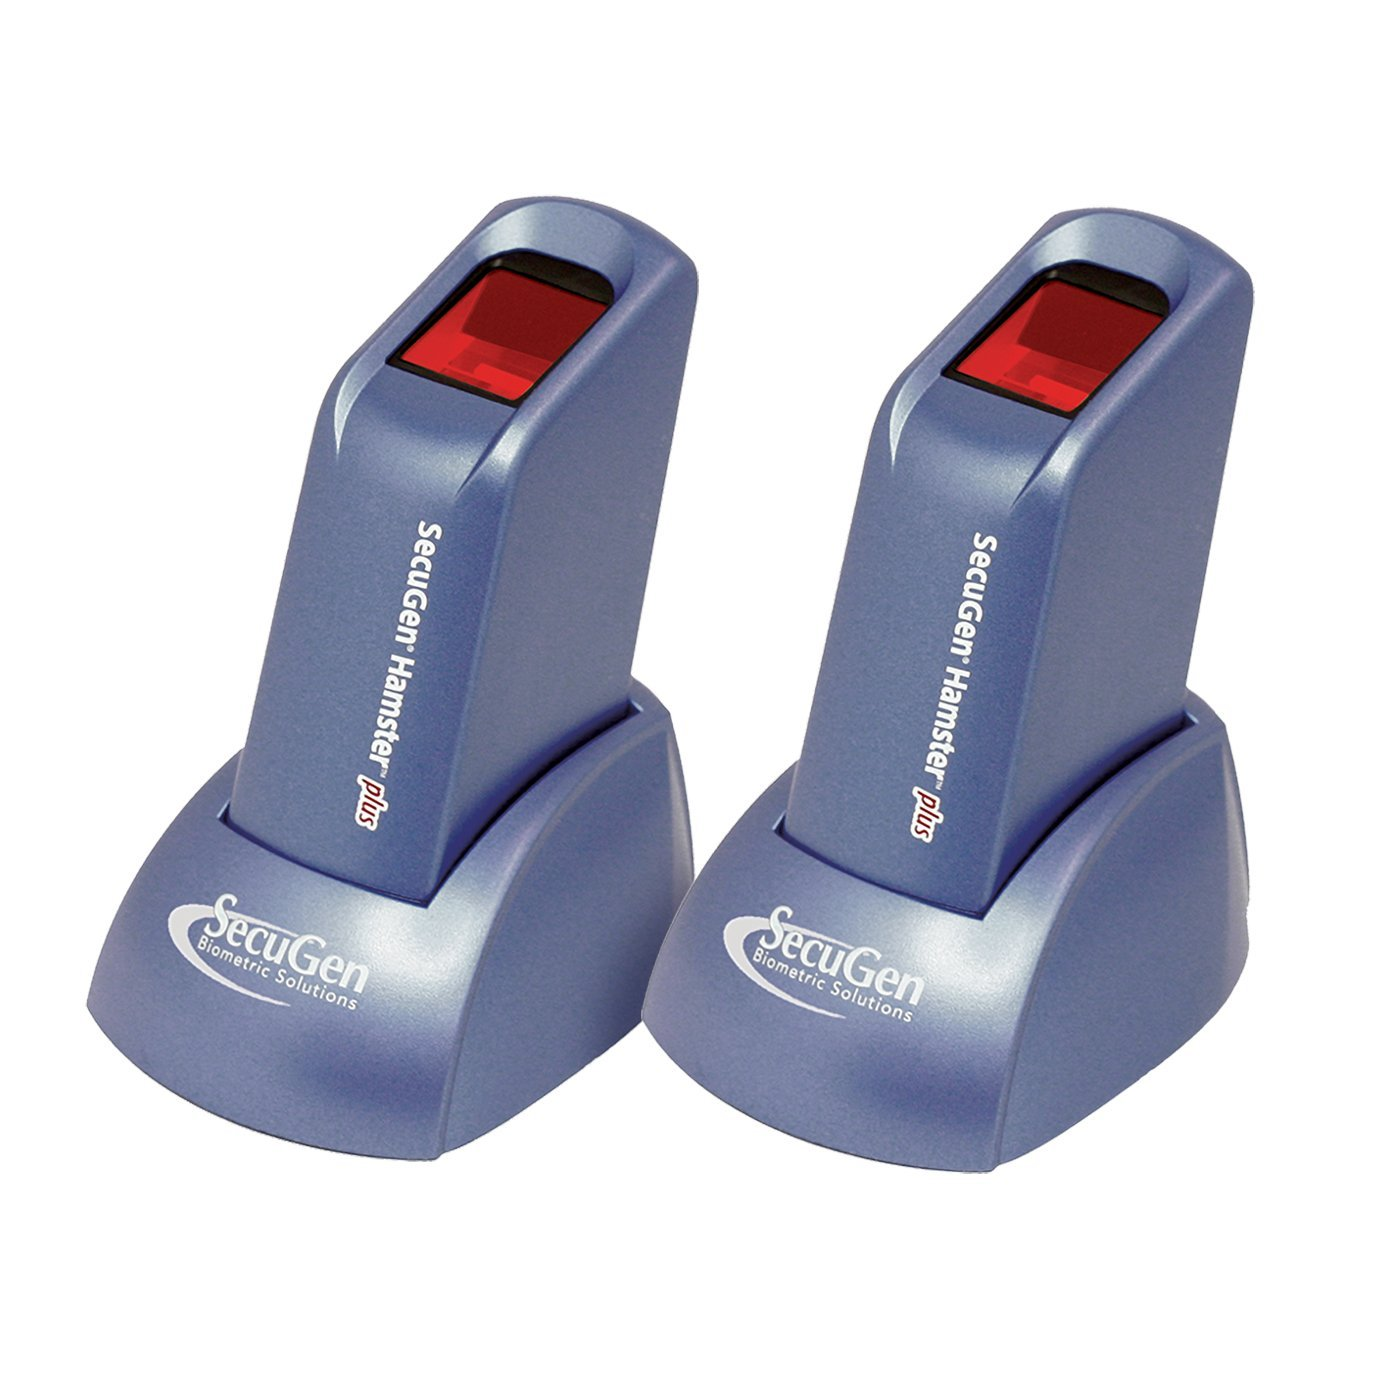 Secugen Hamster Plus Fingerprint Scanner - 2-Pack